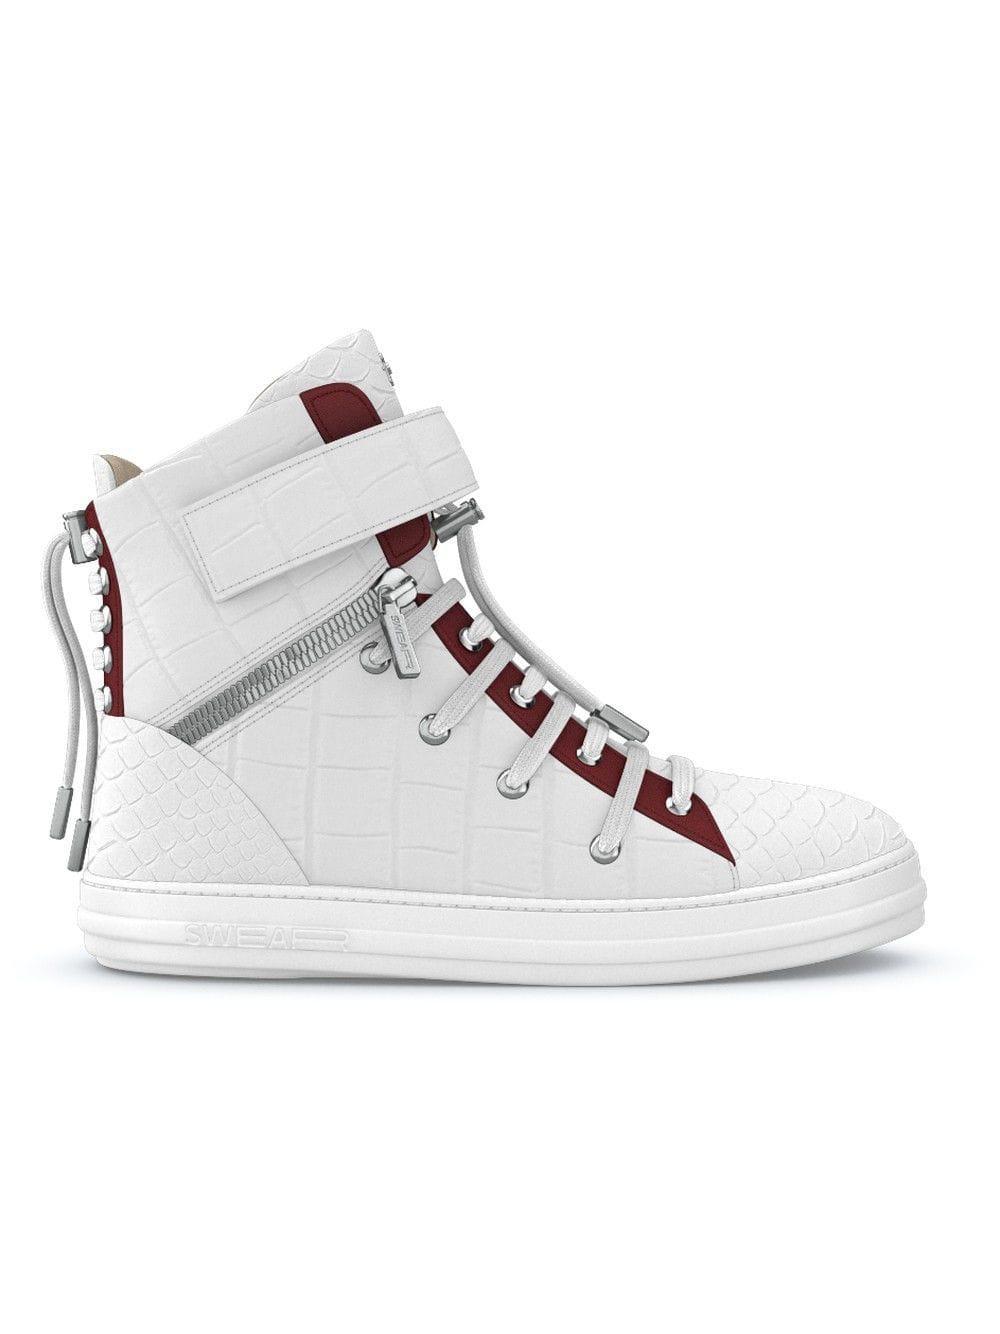 Swear Suede Regent Hi-top Sneakers in White